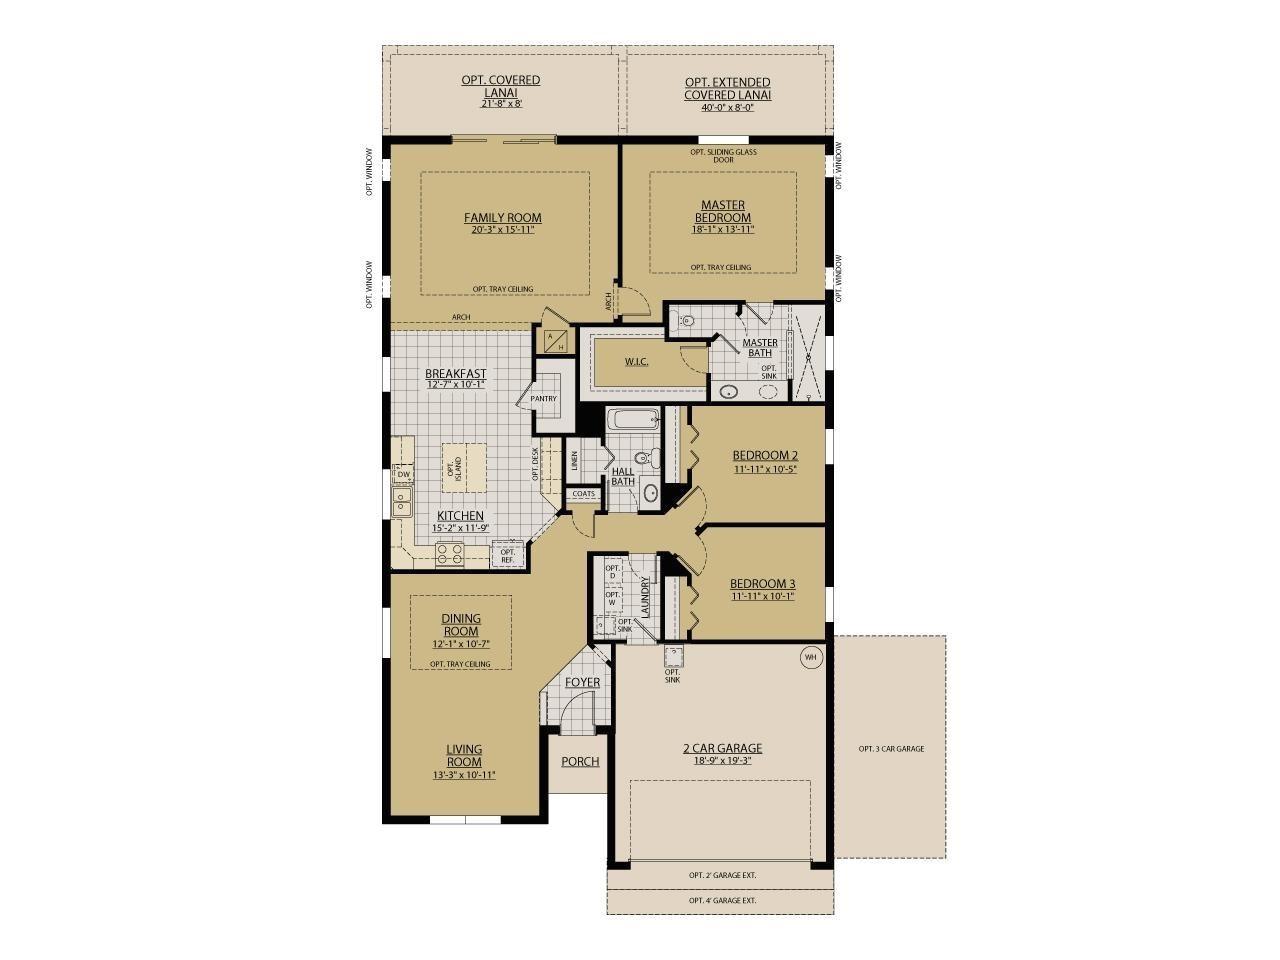 william ryan homes floor plans elegant the sanibel floor plans william ryan homes